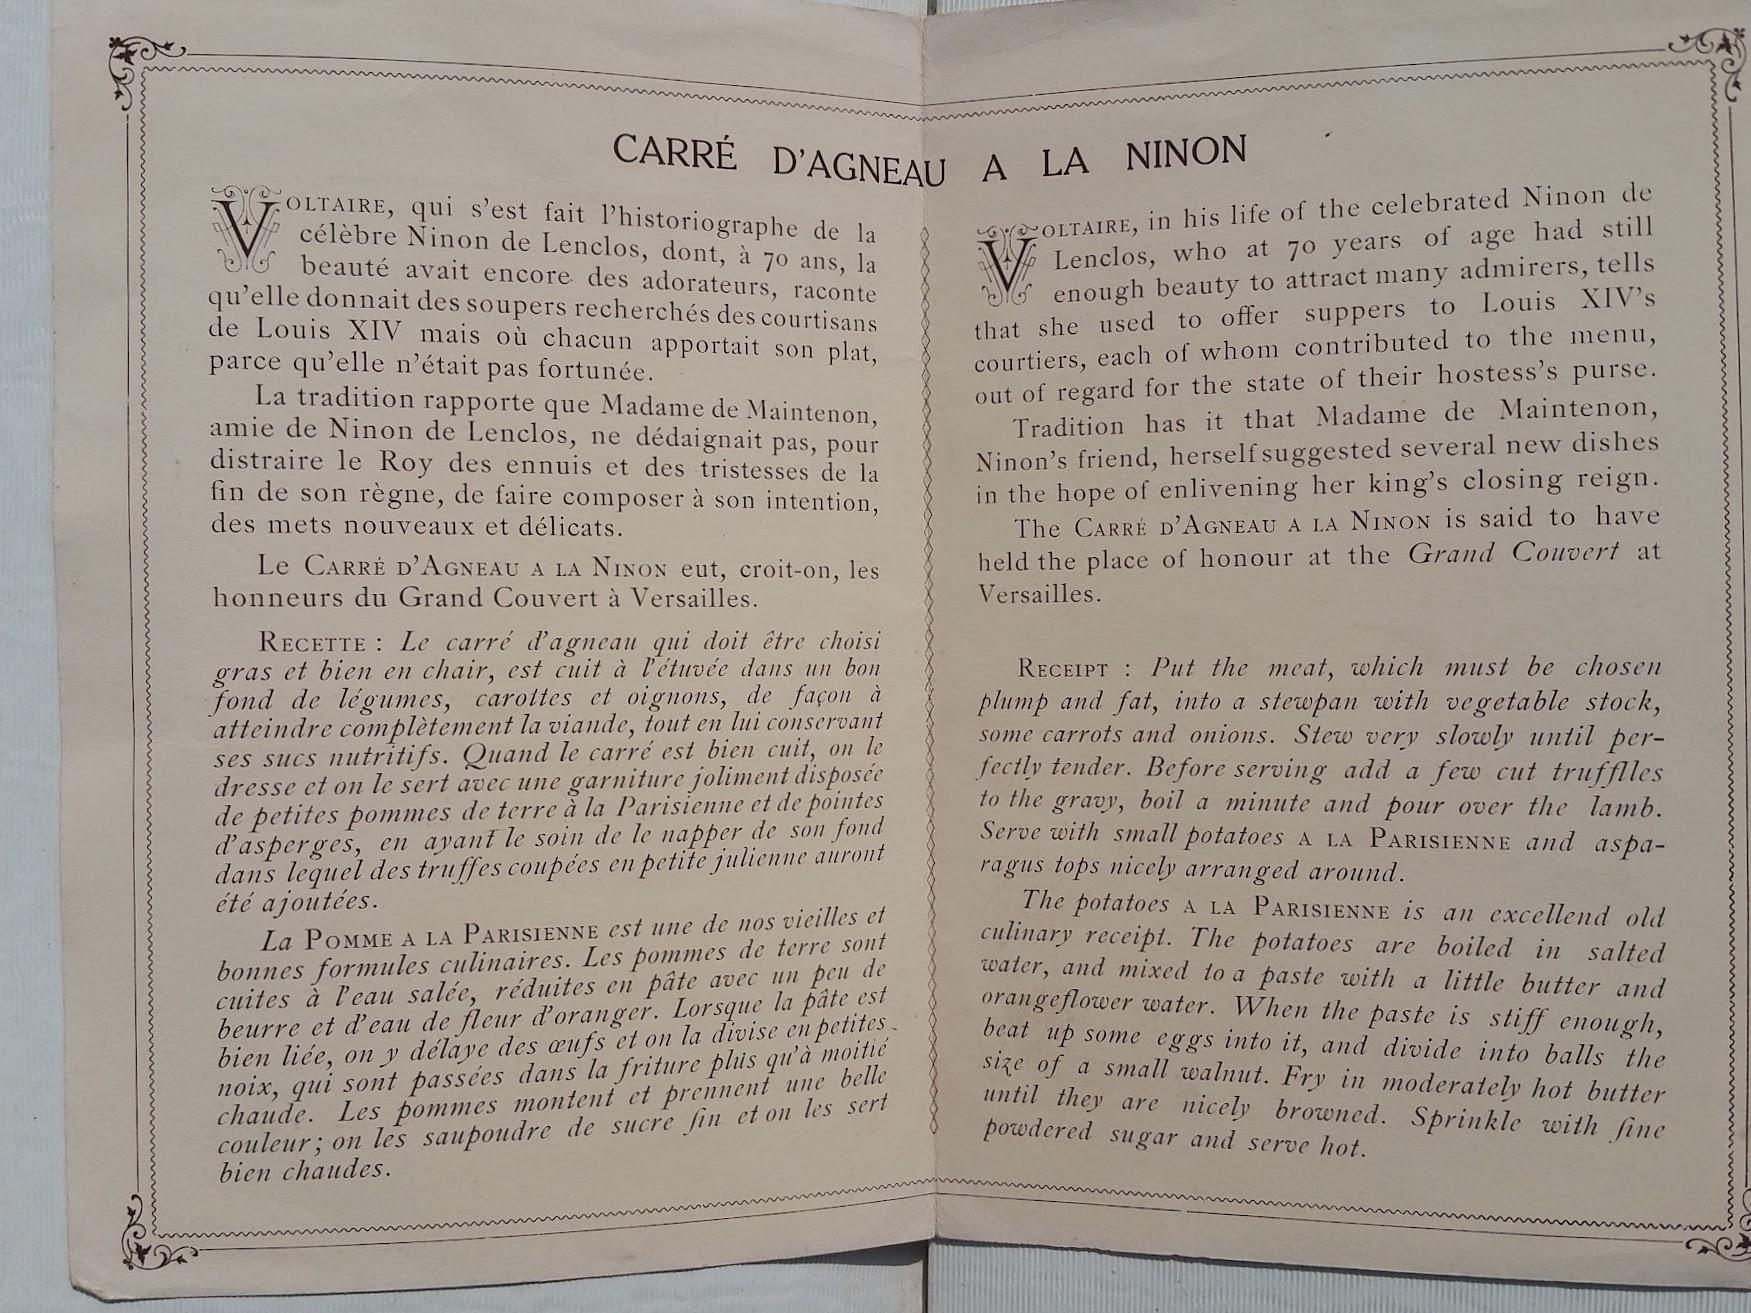 "Compagnie Generale Transatlantique, New York - Le Havre - Paris, Begleitblatt zum 1.Klasse Menü - S.S. ""France II"", 1912"